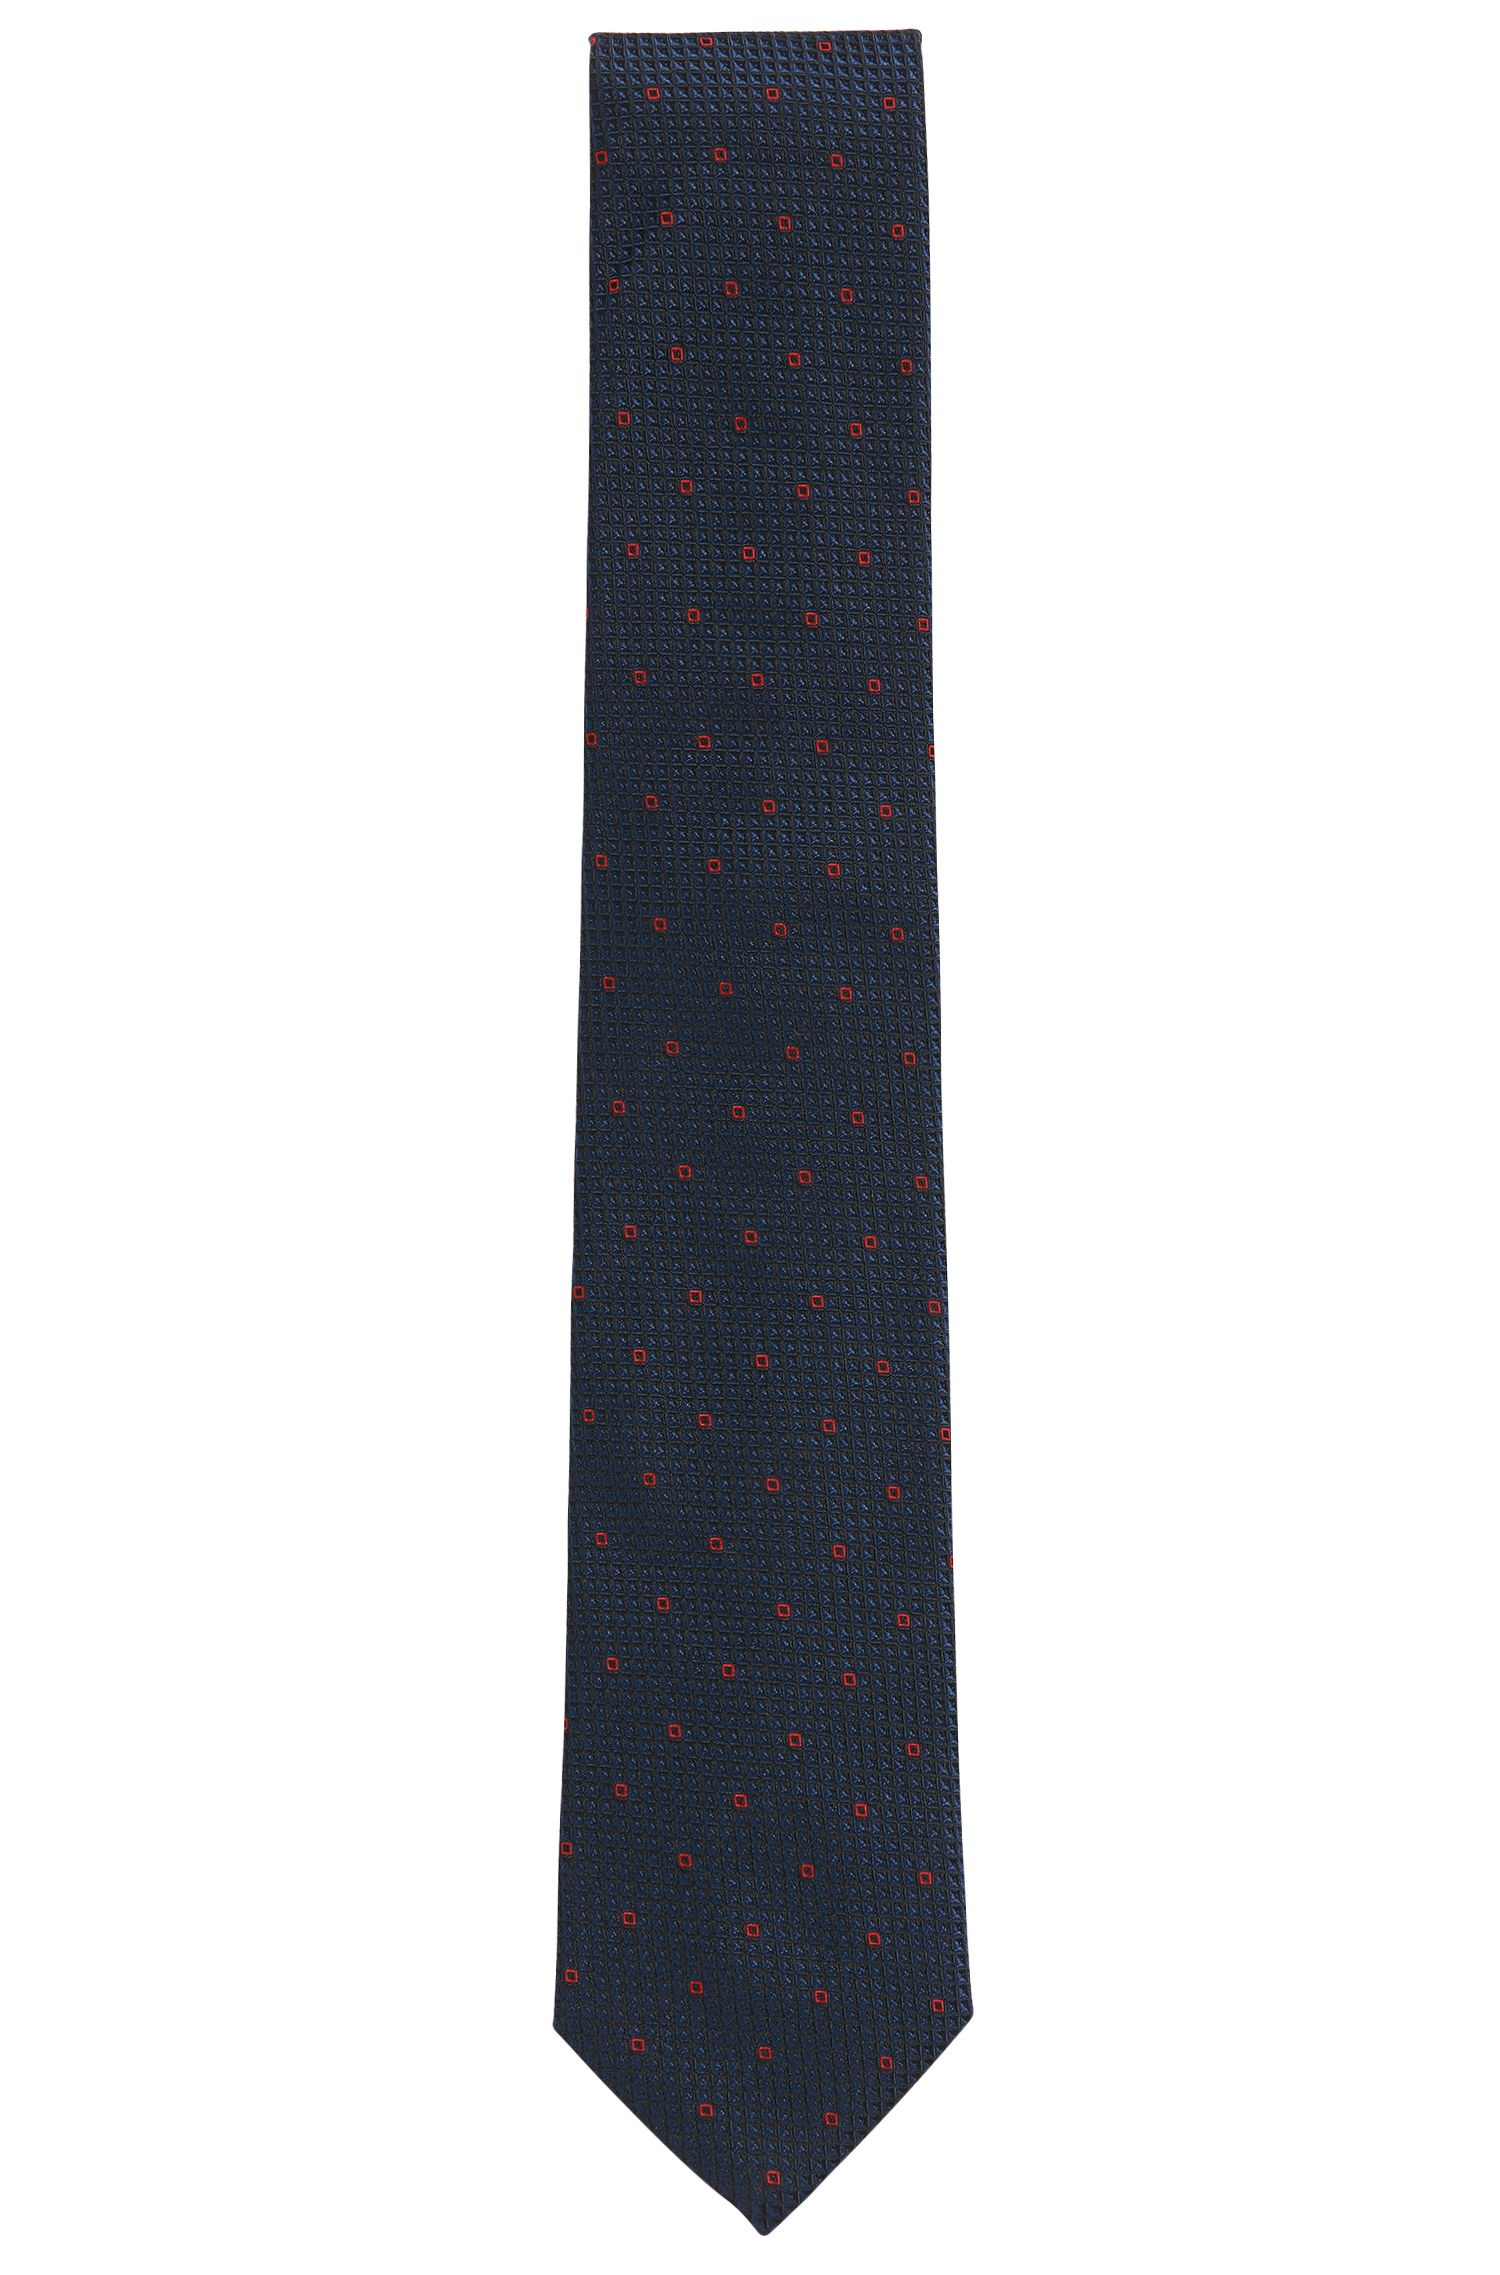 Textured Silk Tie, Regular | Tie 7.5 cm